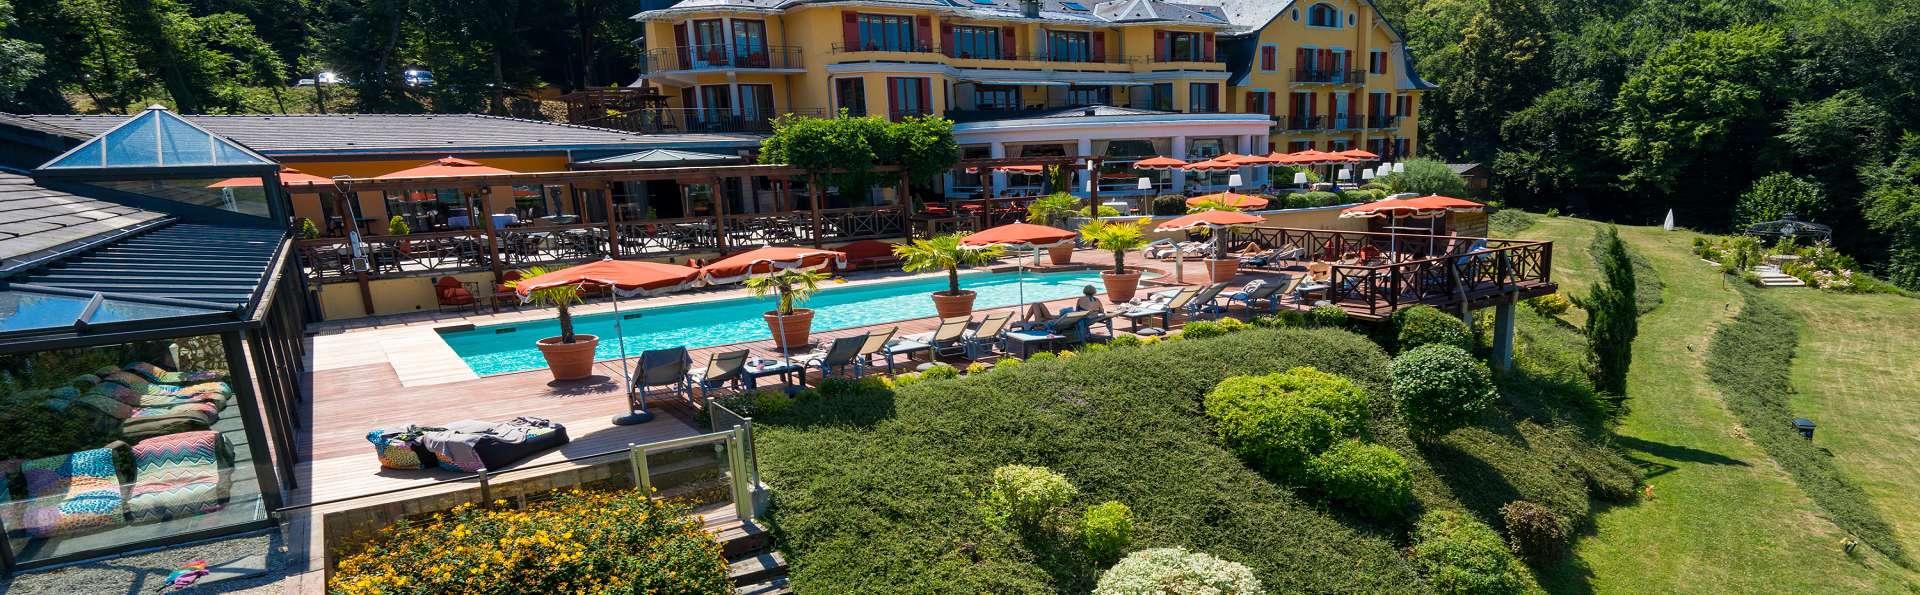 Hôtel les Trésoms Lake and Spa Resort - Annecy - tresoms-66.jpg